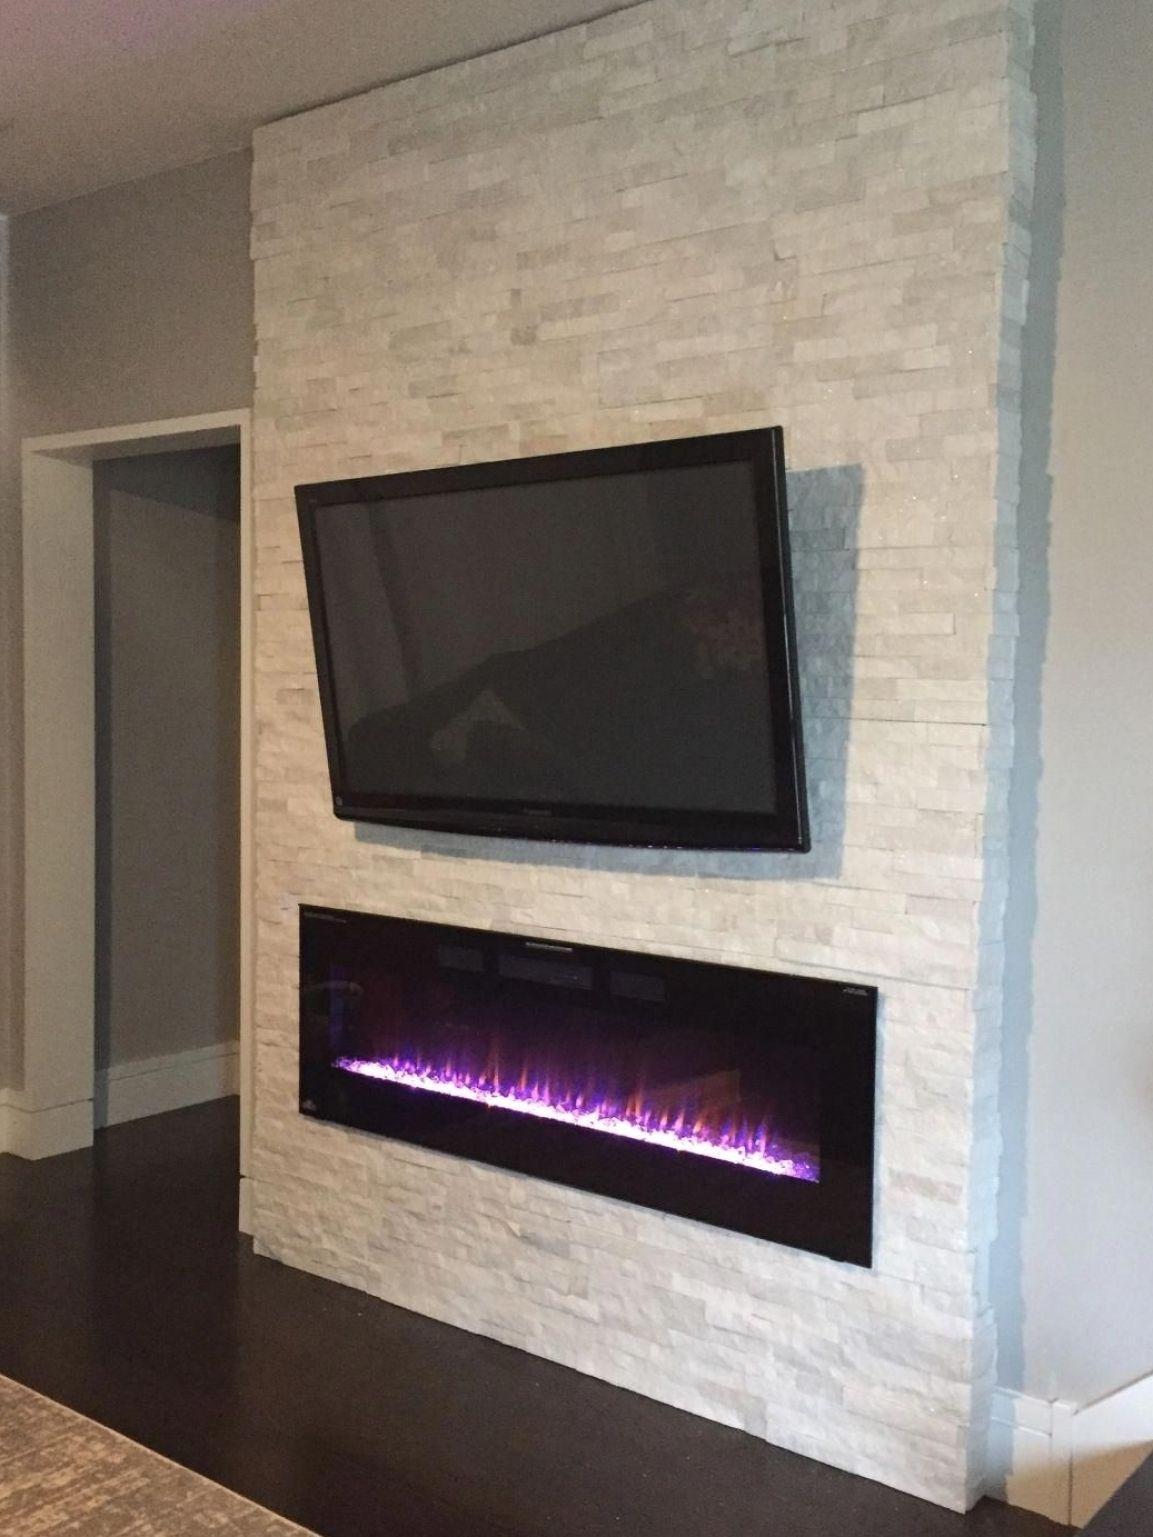 decor inspiration #fireplacemakeover #fireplaceideas #fireplacedecor